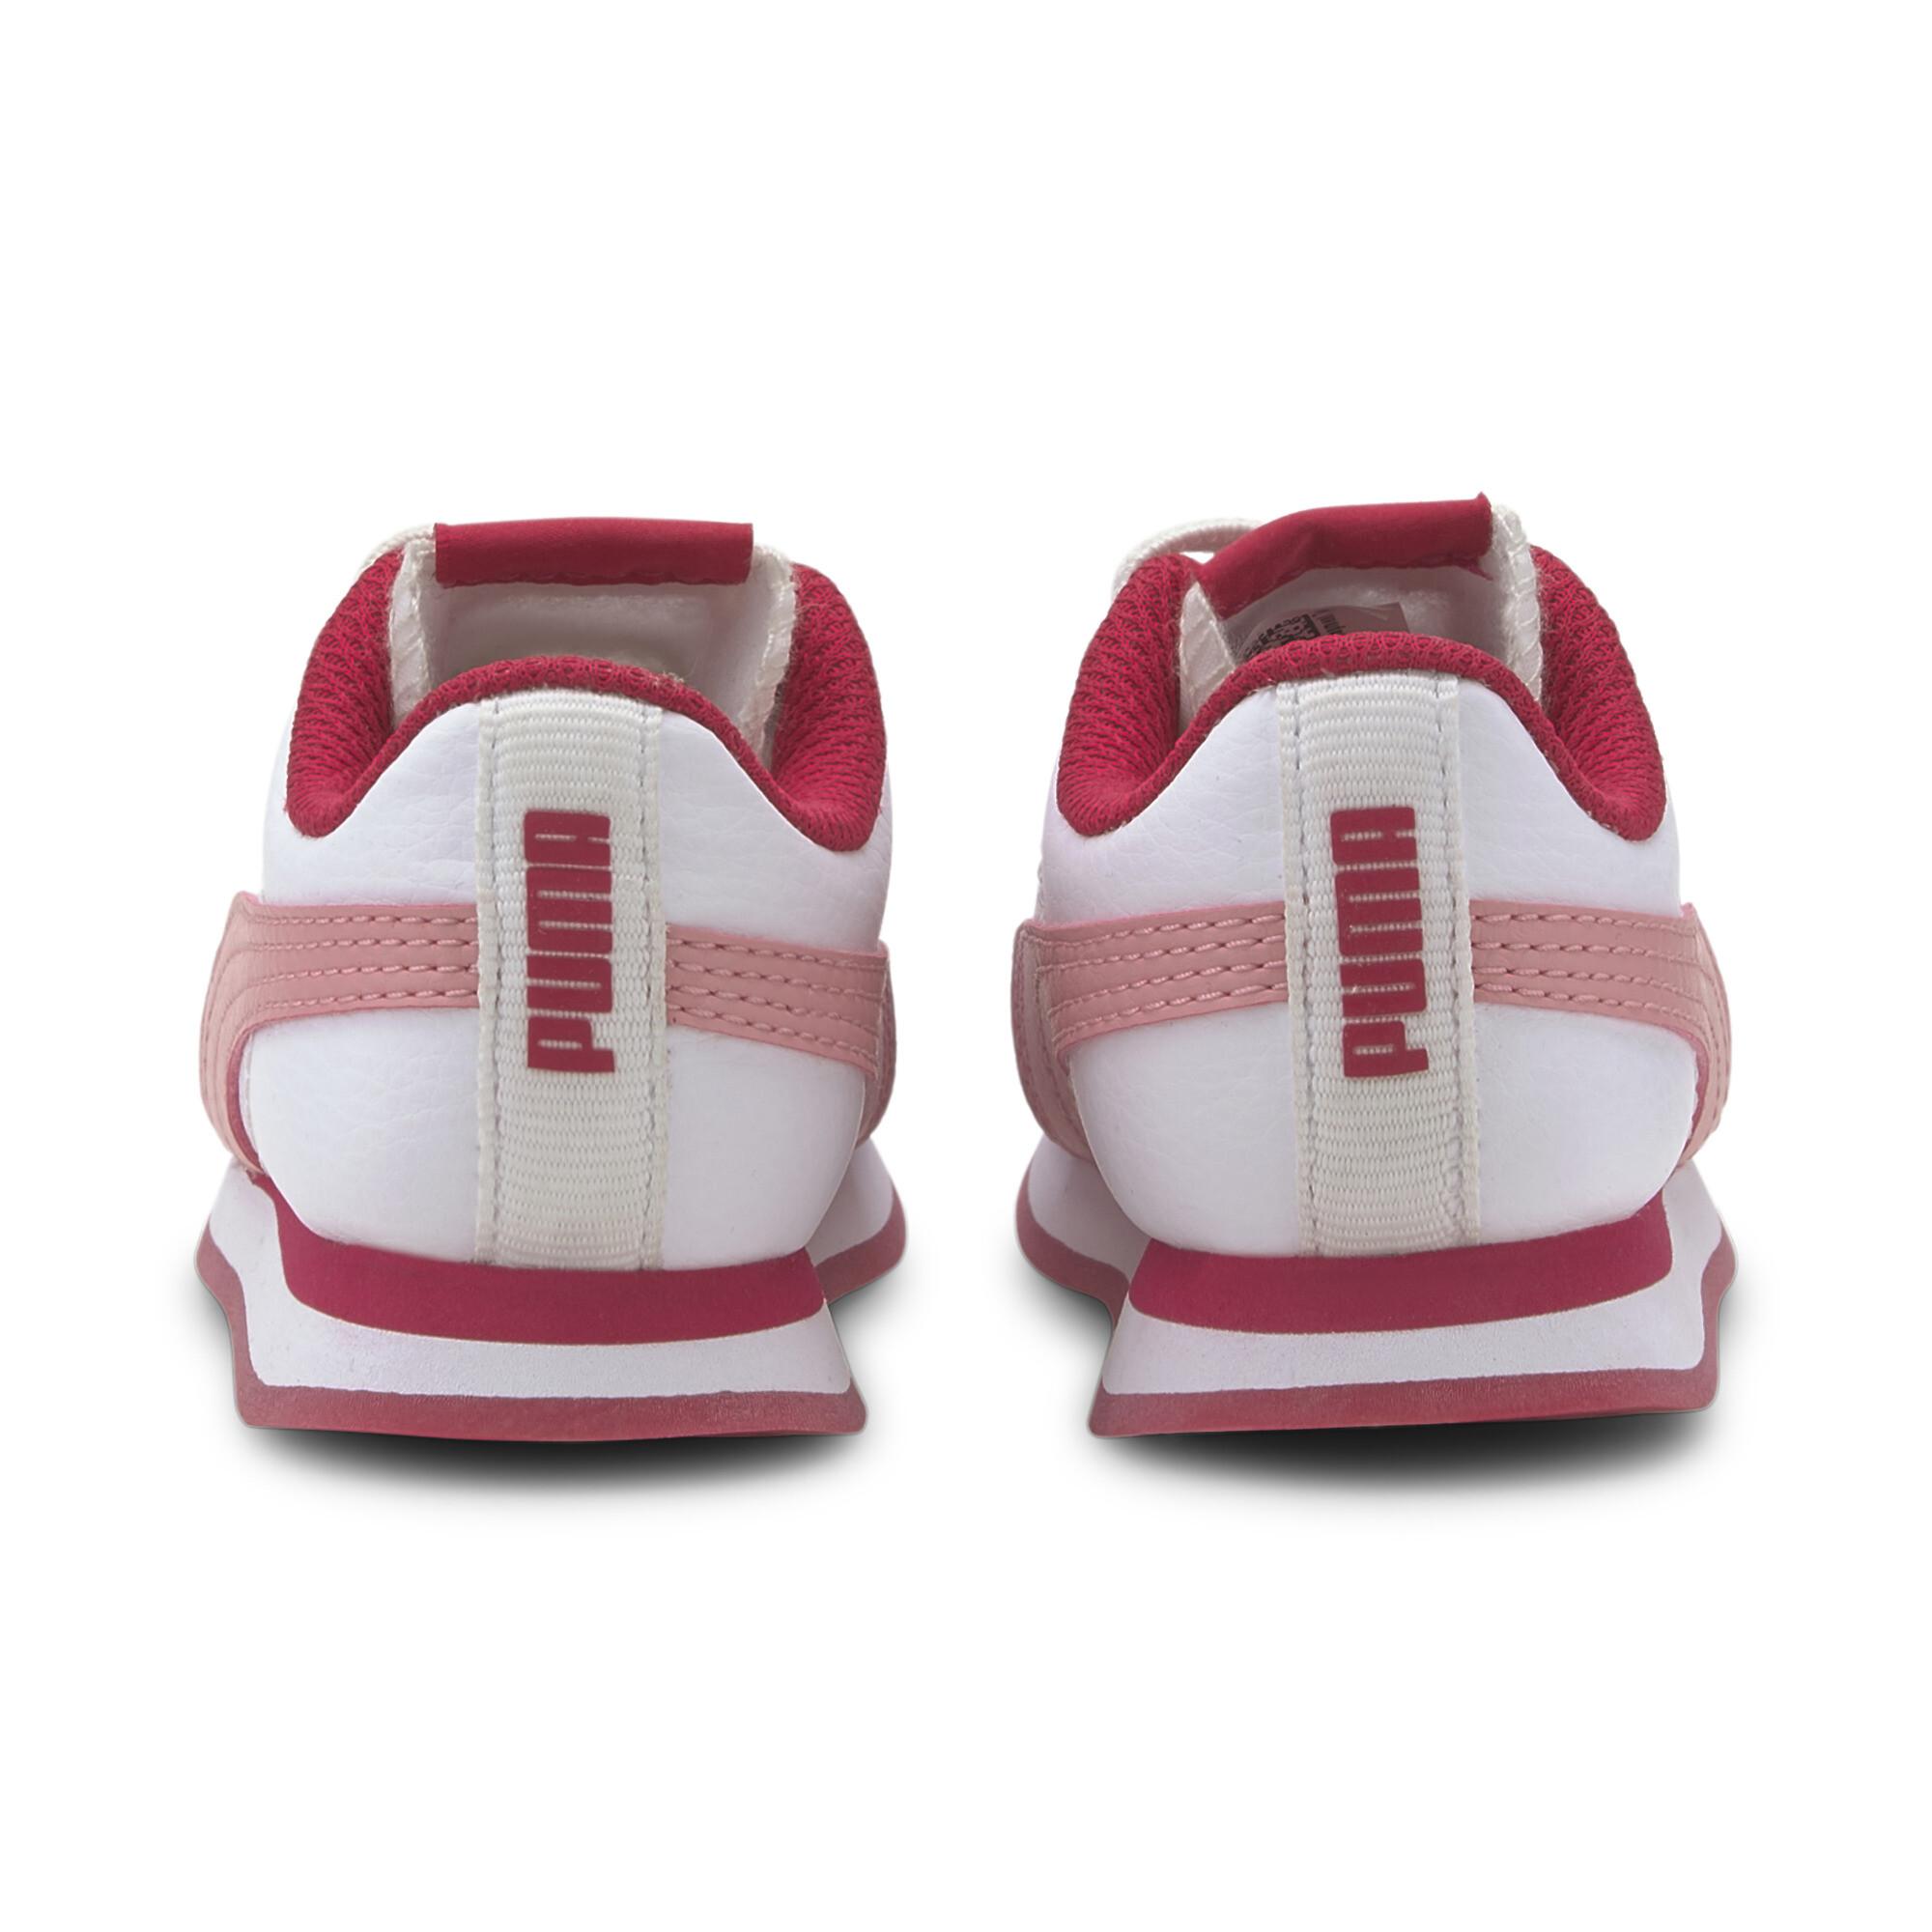 PUMA-Turin-II-AC-Toddler-Shoes-Unisex-Shoe-Kids thumbnail 18